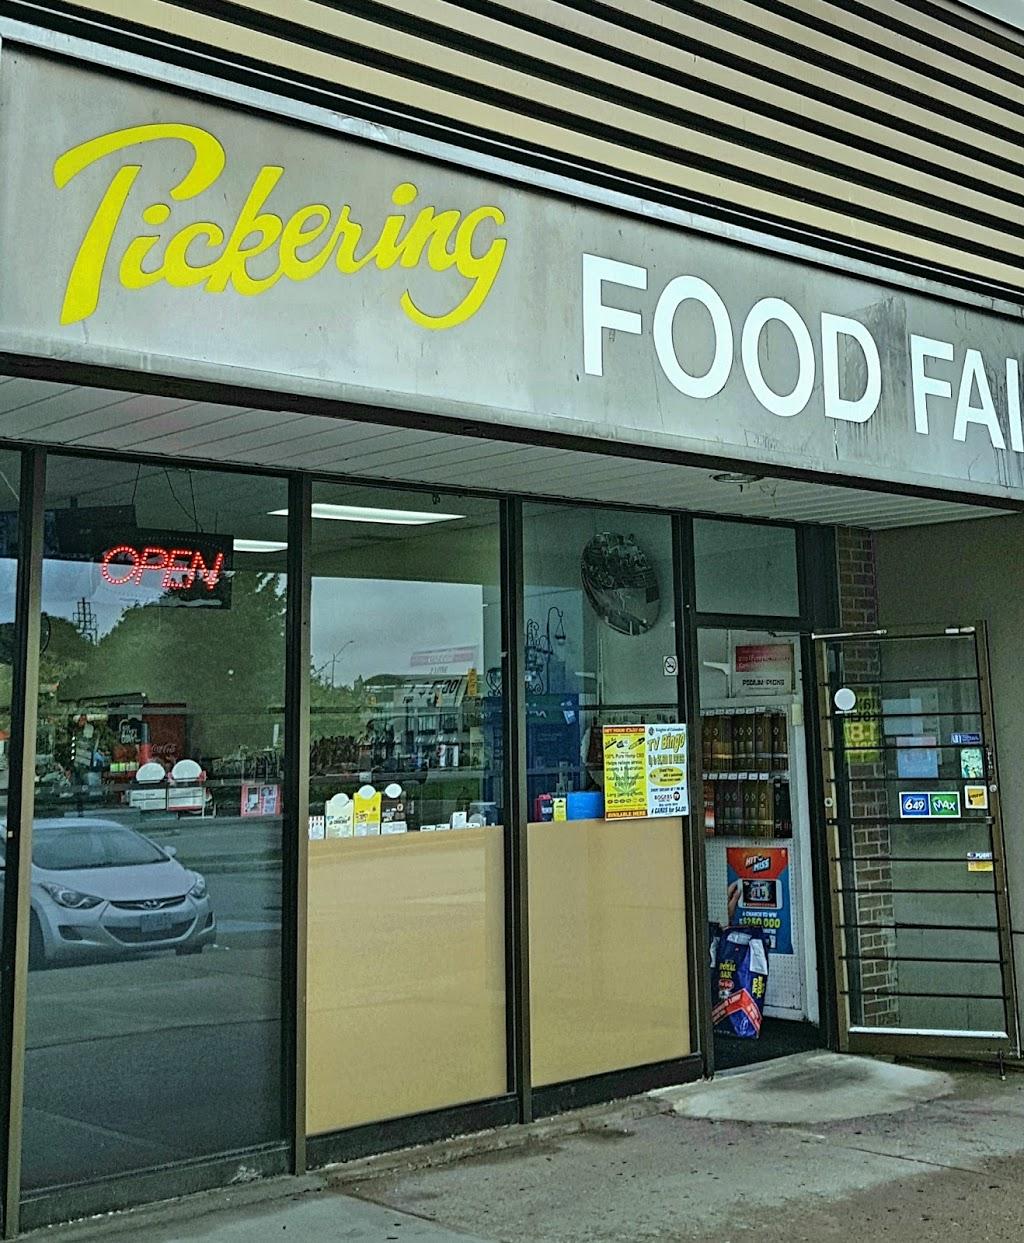 Pickering Food Fair/Vape Shop/JUUL/STLTH - Convenience store